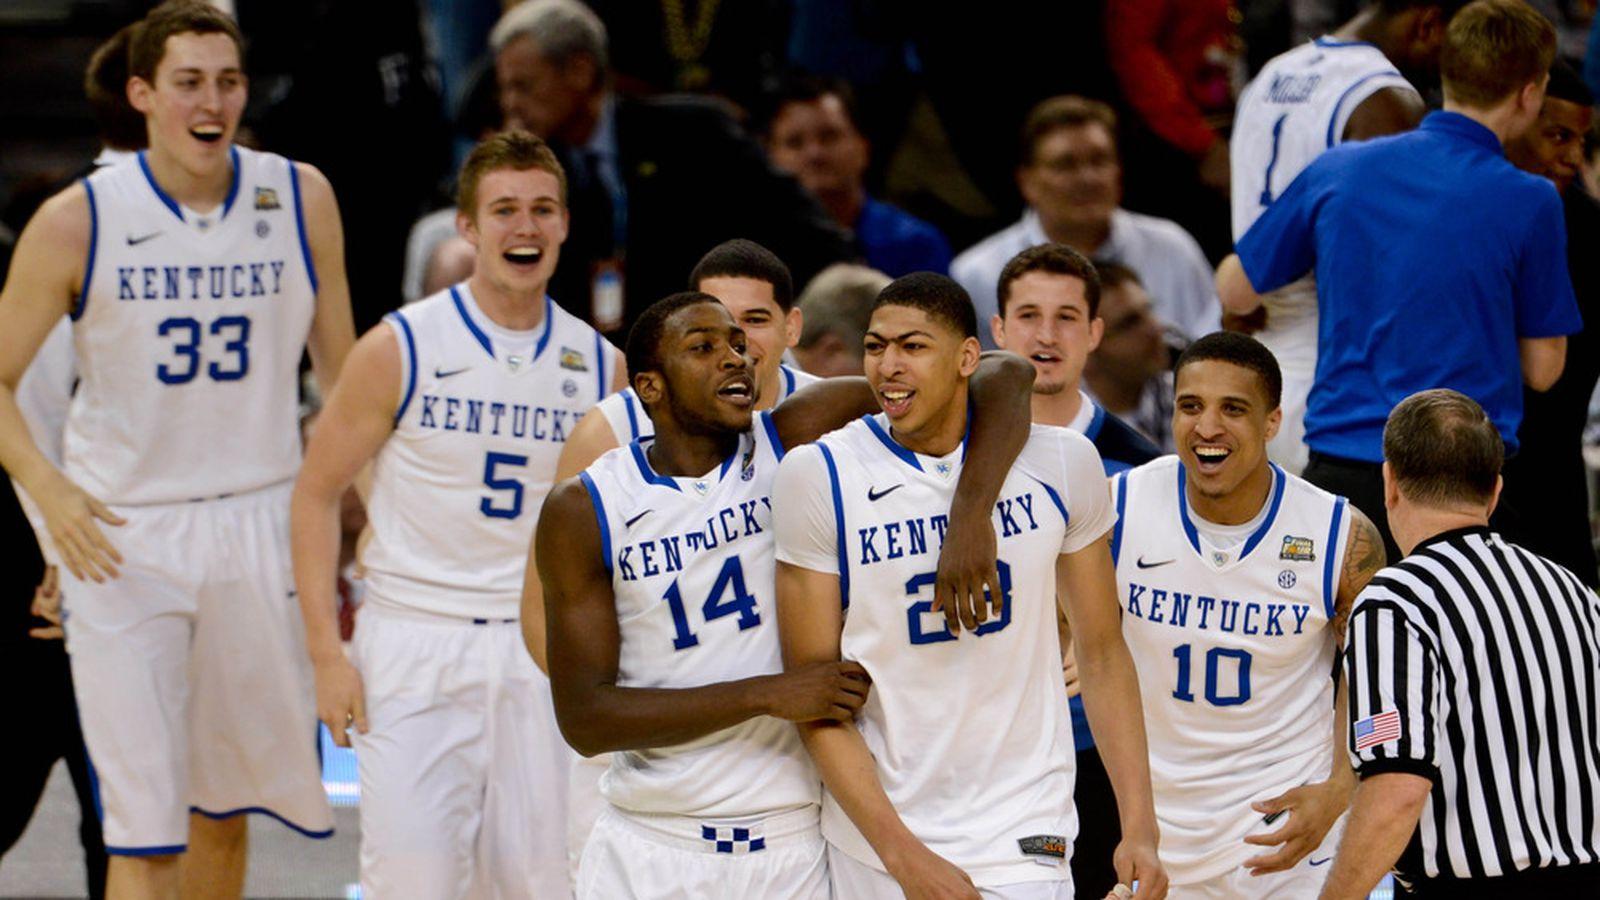 2013 Recruits Uk Basketball And Football Recruiting News: Kentucky Basketball Recruiting: Wayne Selden Reclassifies